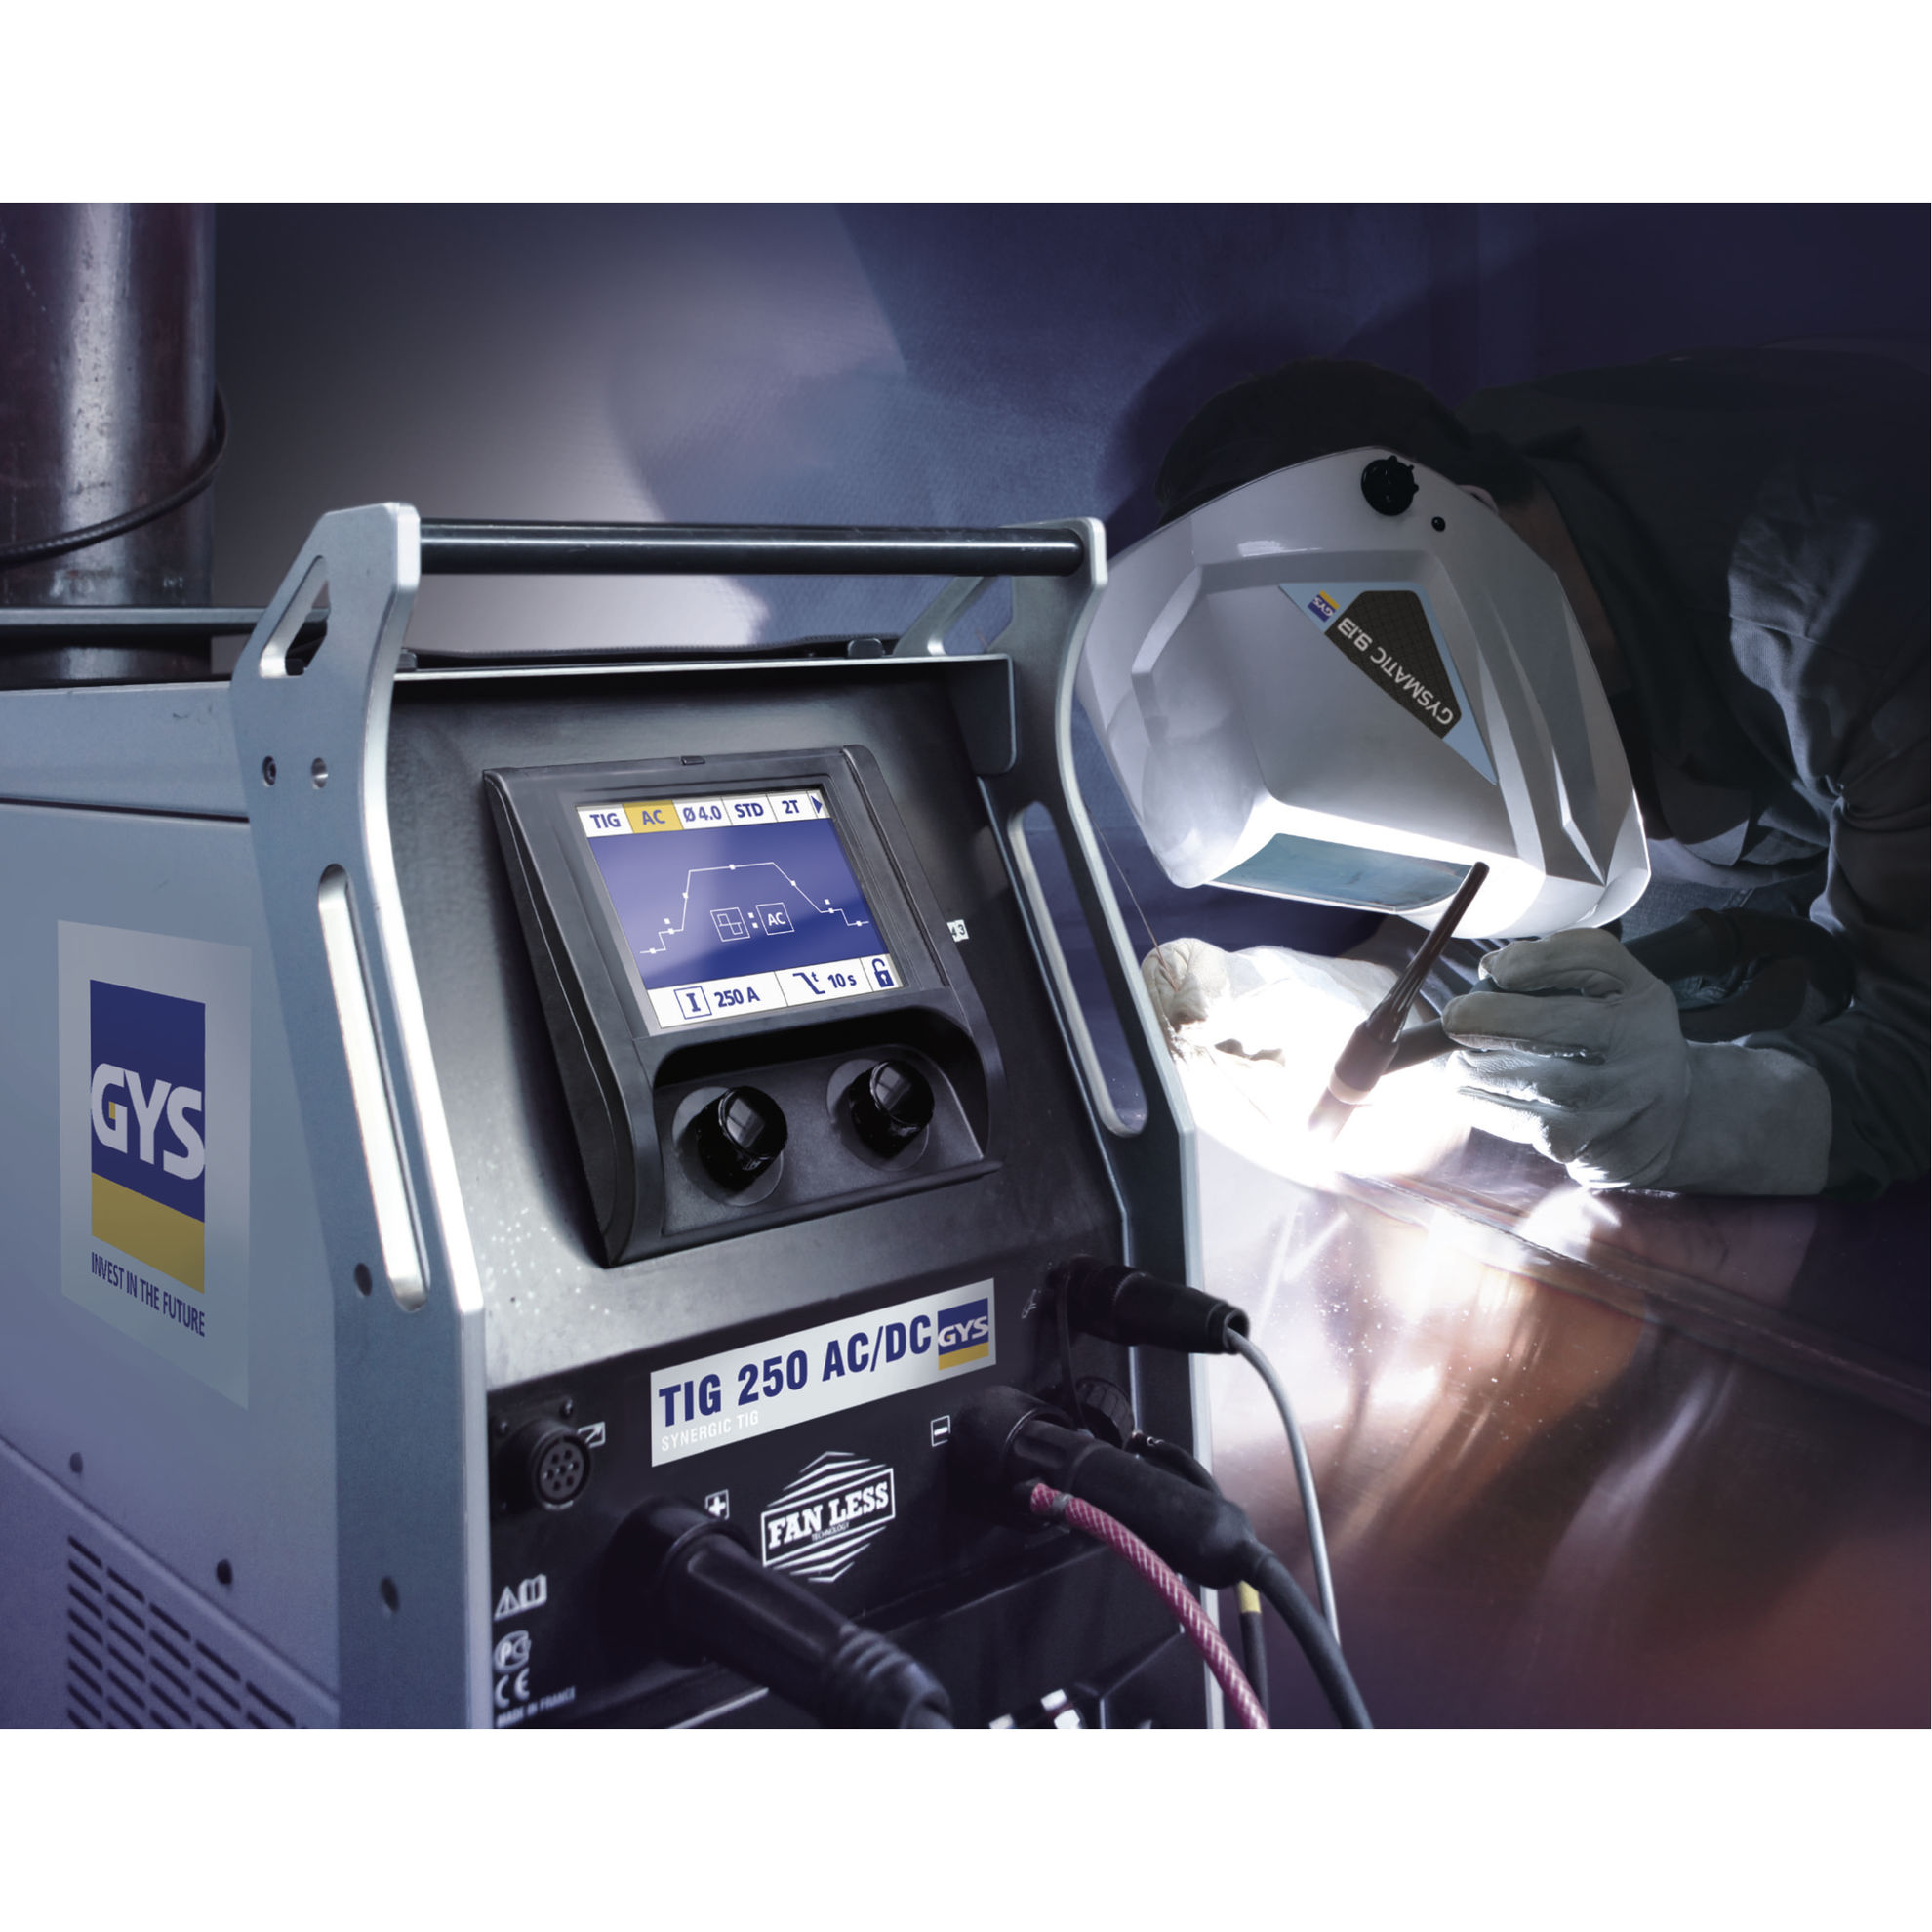 Slika Varilni aparat GYS, TIG 250 AC/DC HF